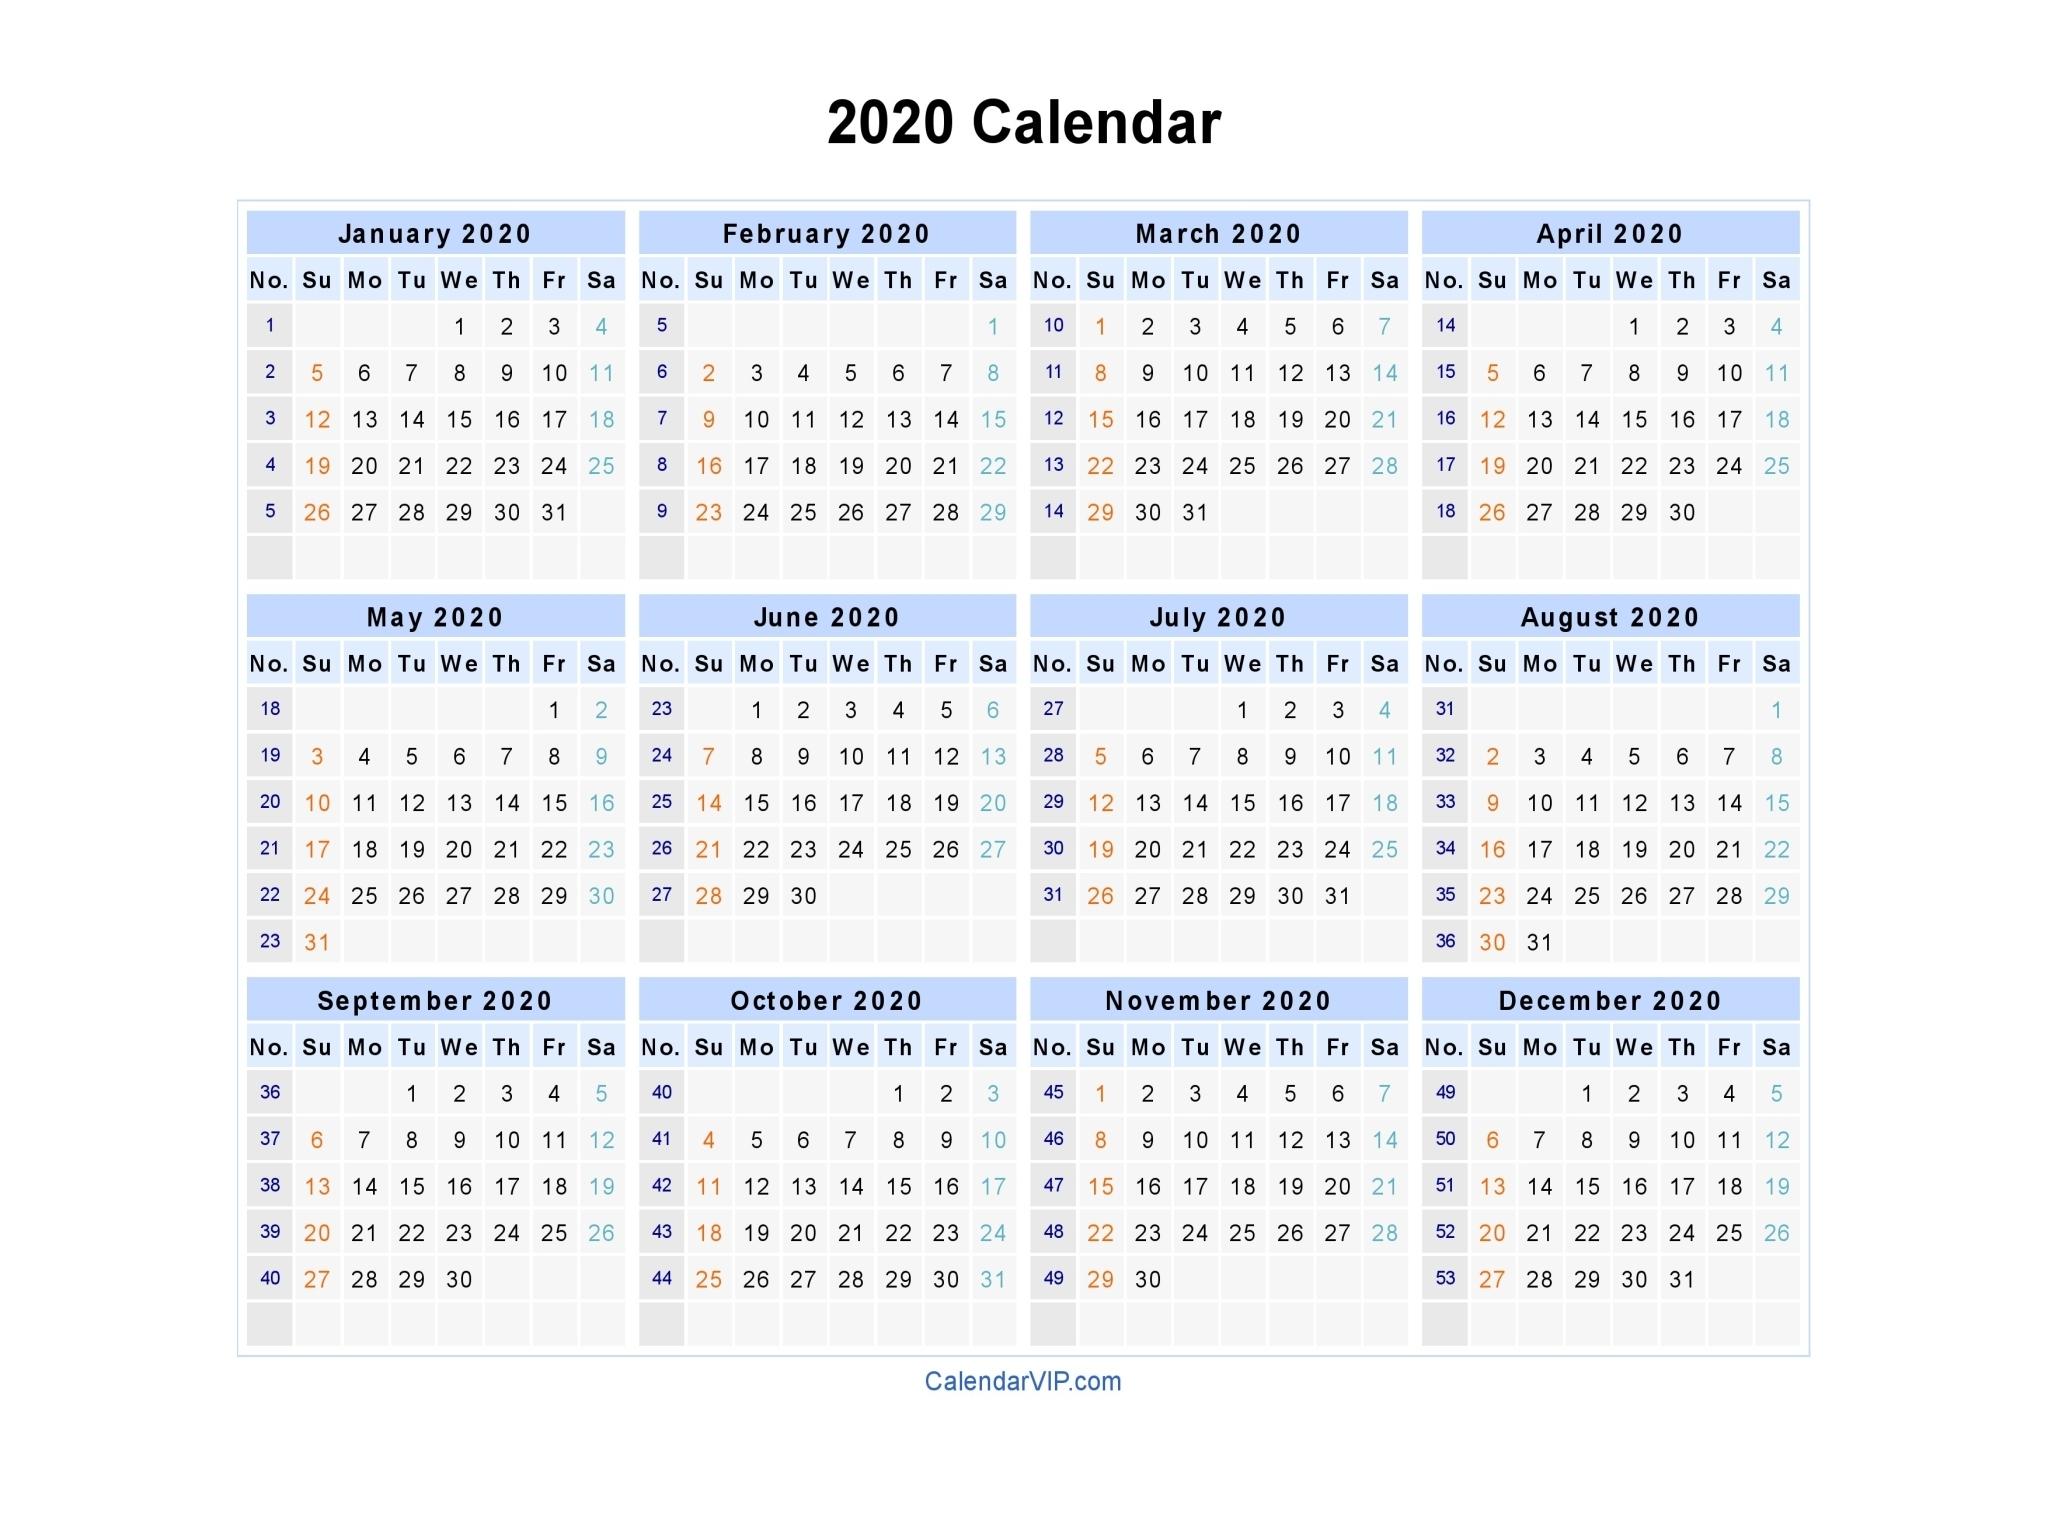 2020 Calendar - Blank Printable Calendar Template In Pdf Word Excel with regard to Printable 2020 Calendar I Can Edit